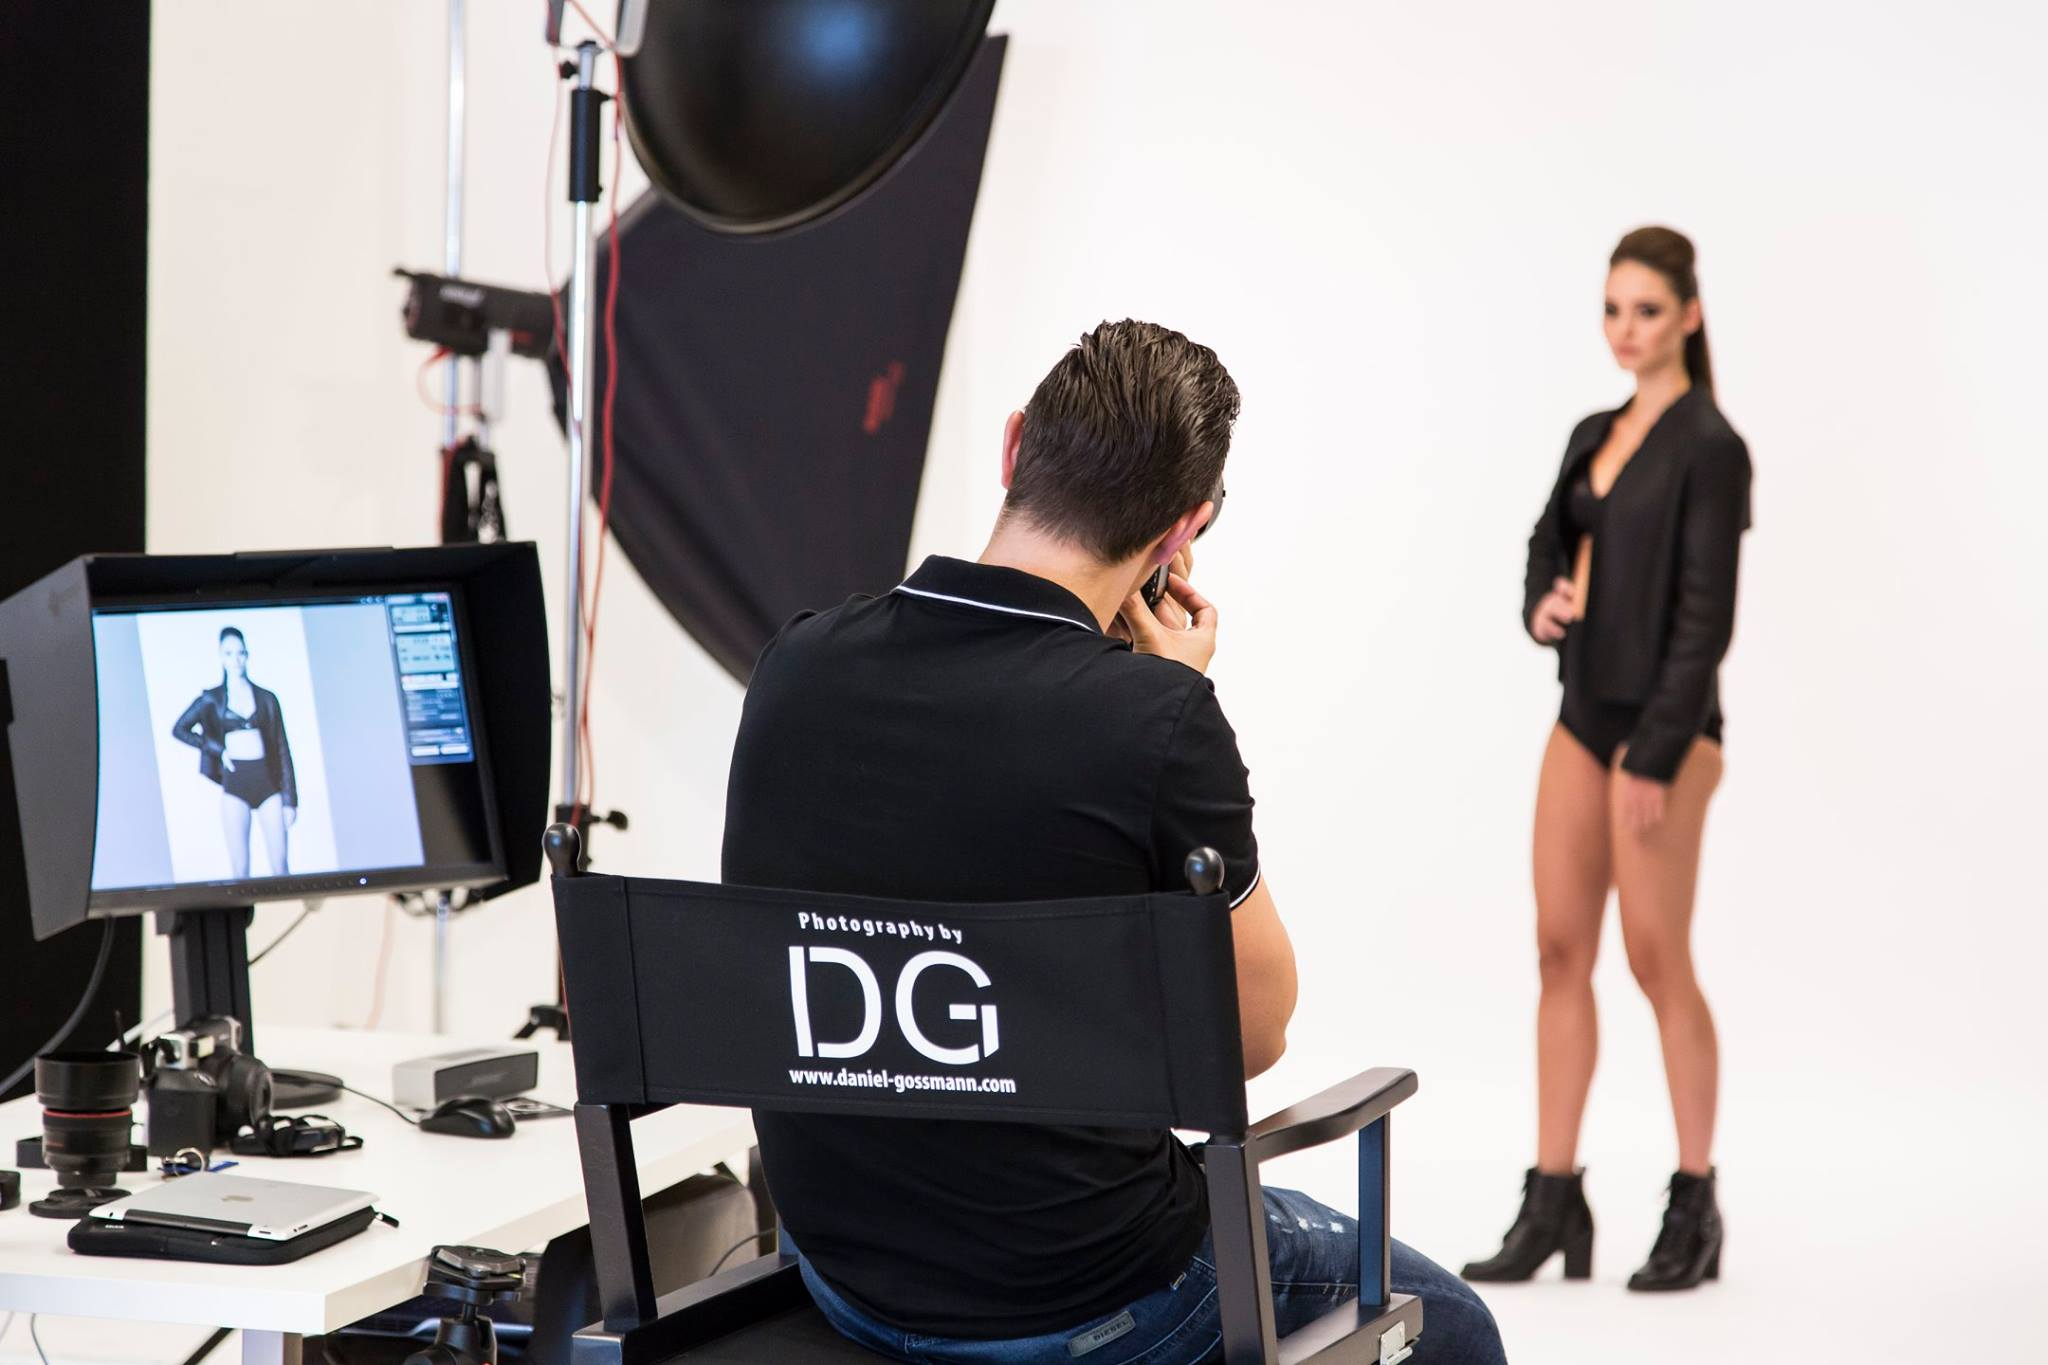 Julia Furdea Daniel Gossmann Puls4 iLIKE Miss Austria copyright Studiozone 2